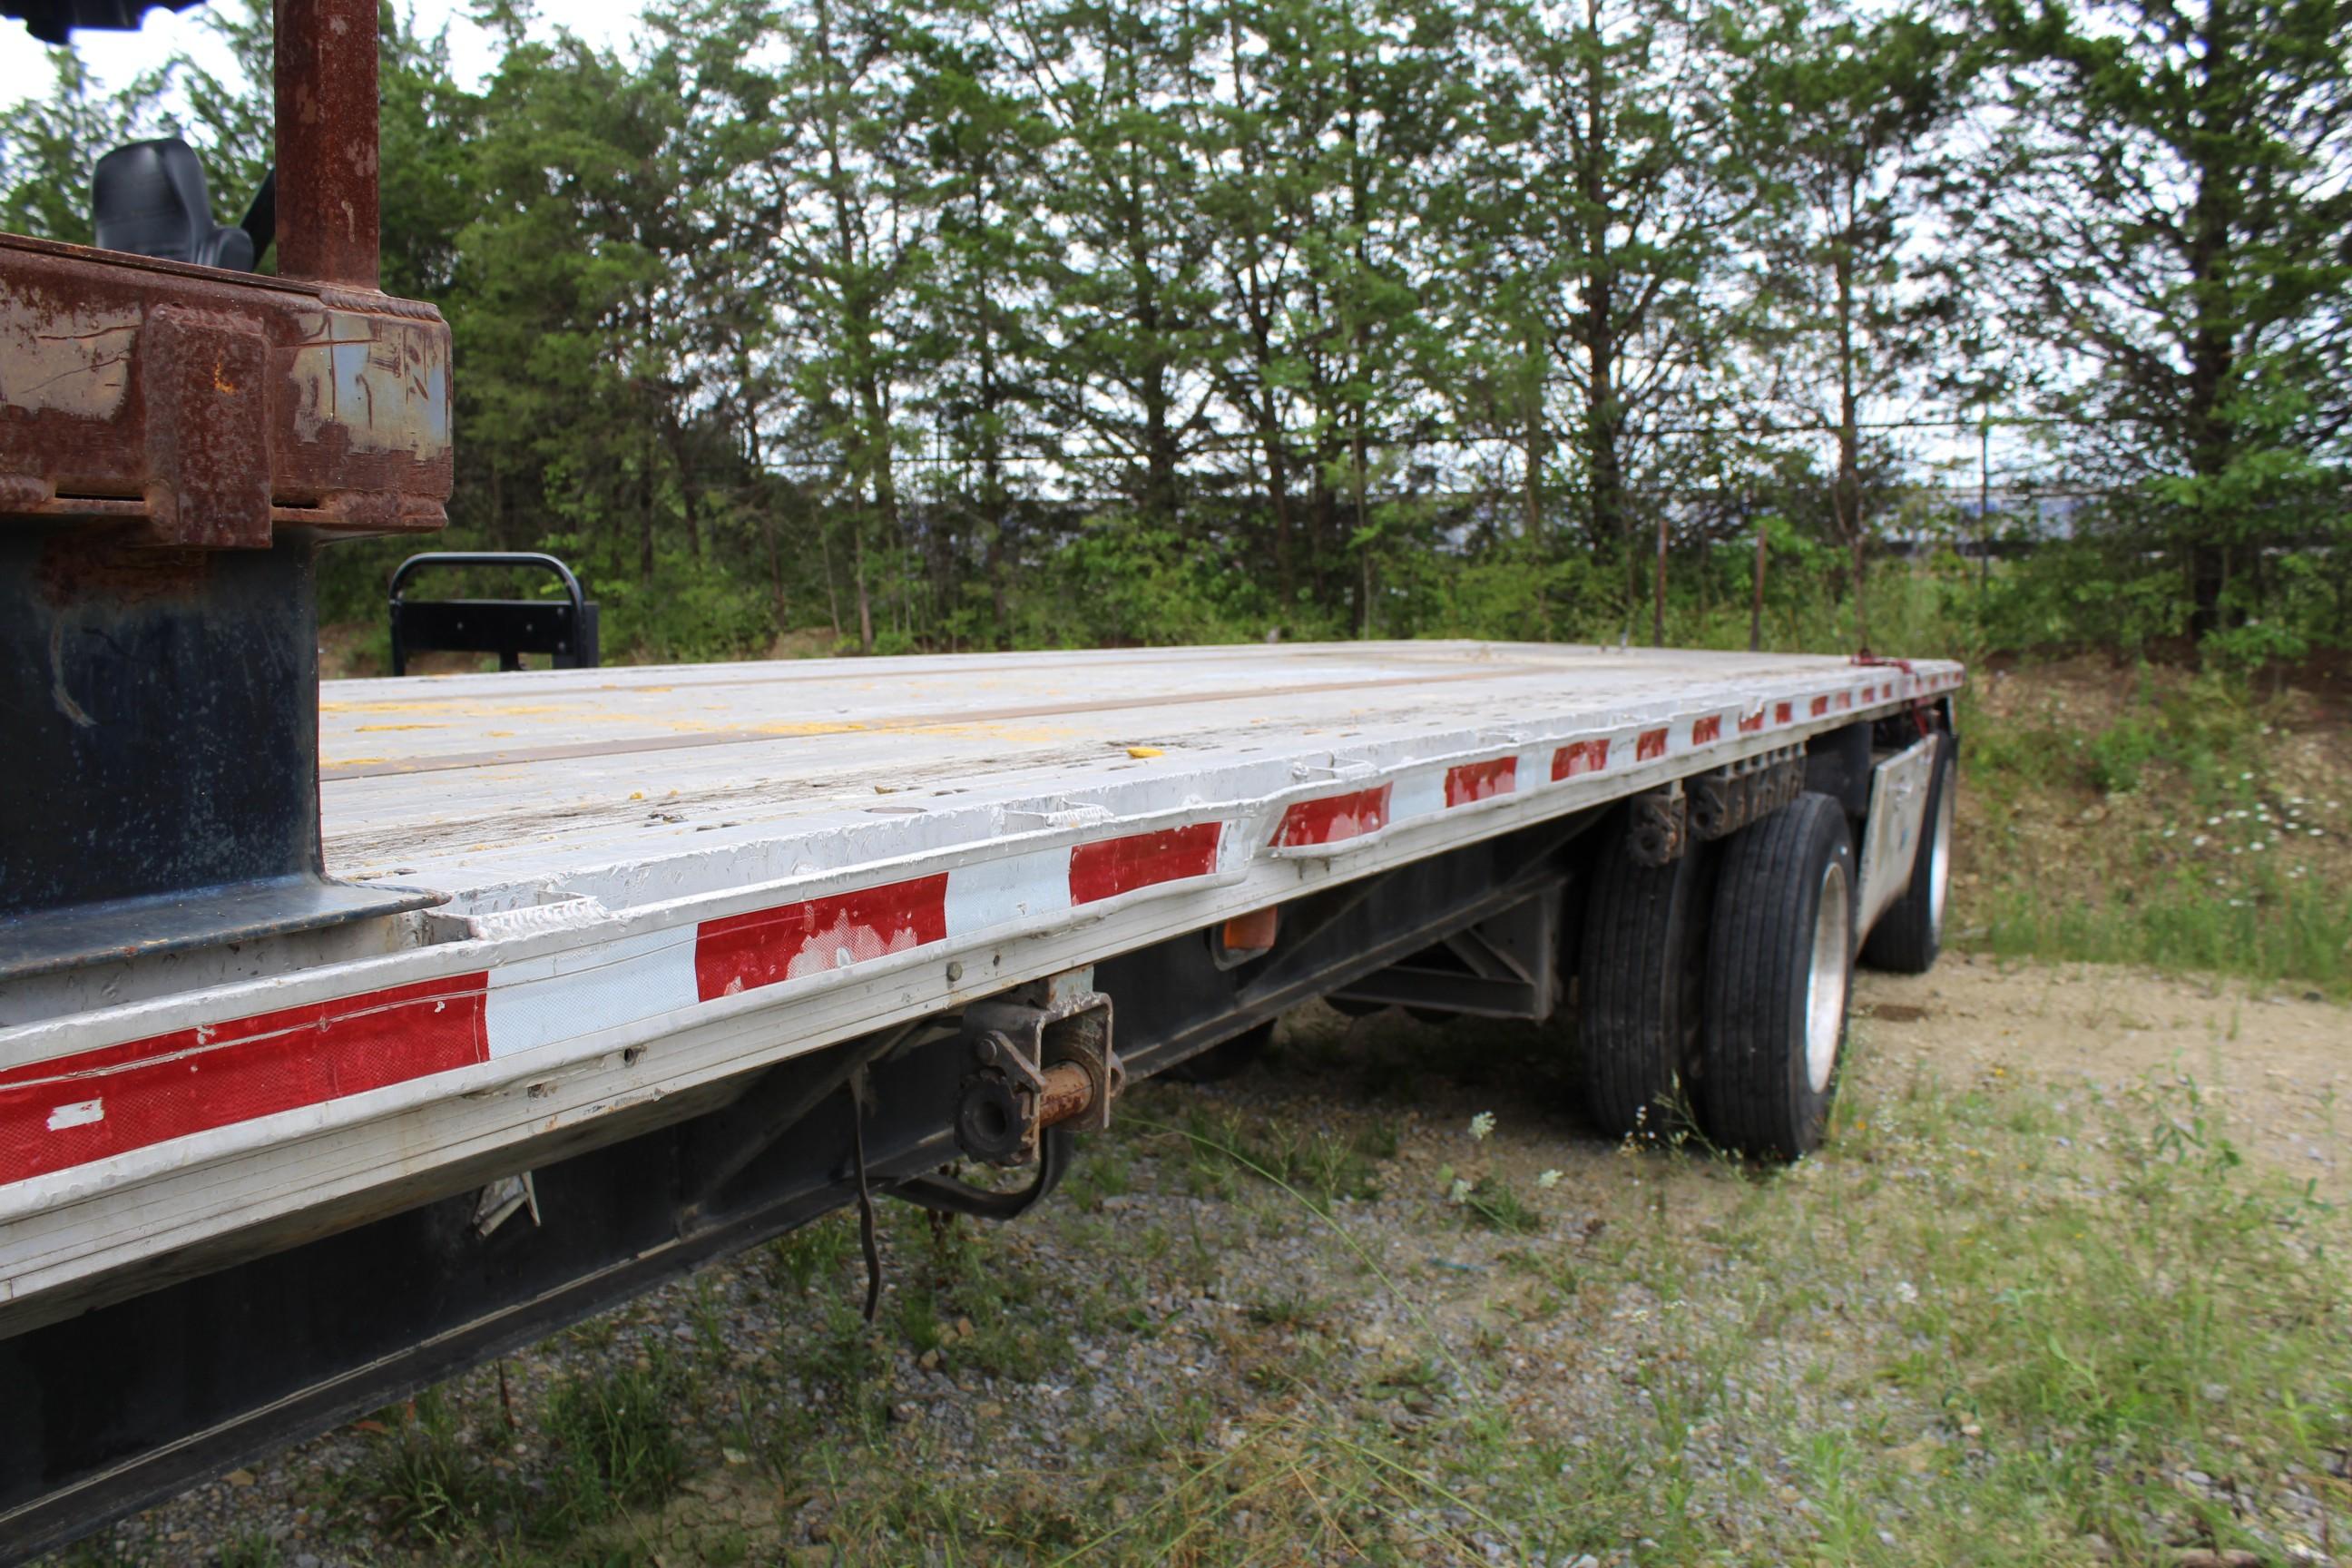 Lot 6 - 1995 Fontaine 48' Spread Axle Trailer, Aluminum Bed, Steel Frame, Model LFTW-5-8048WSAK